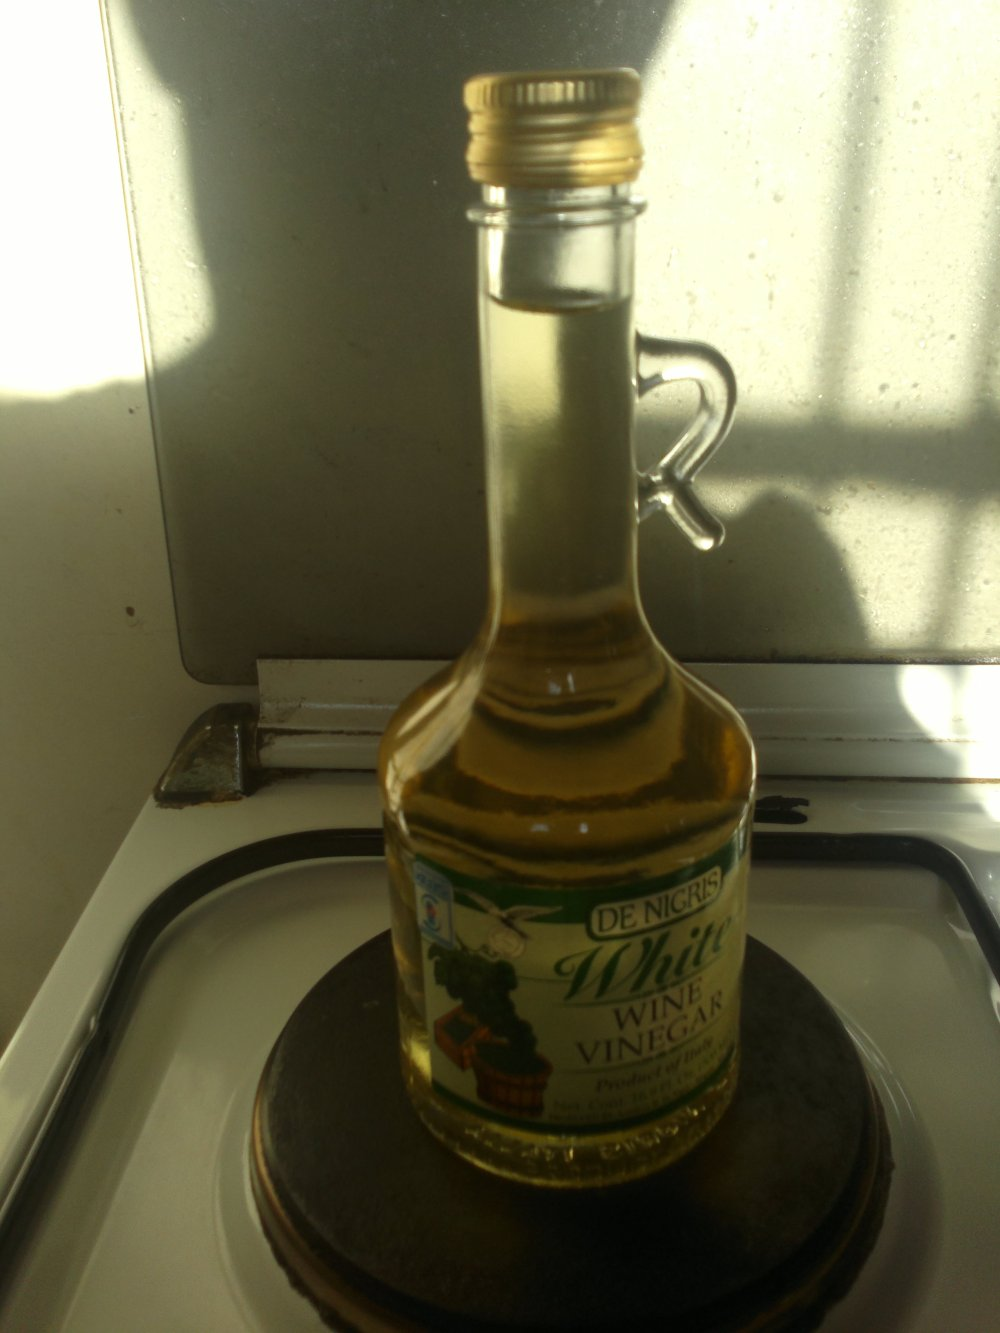 White wine vinegar..